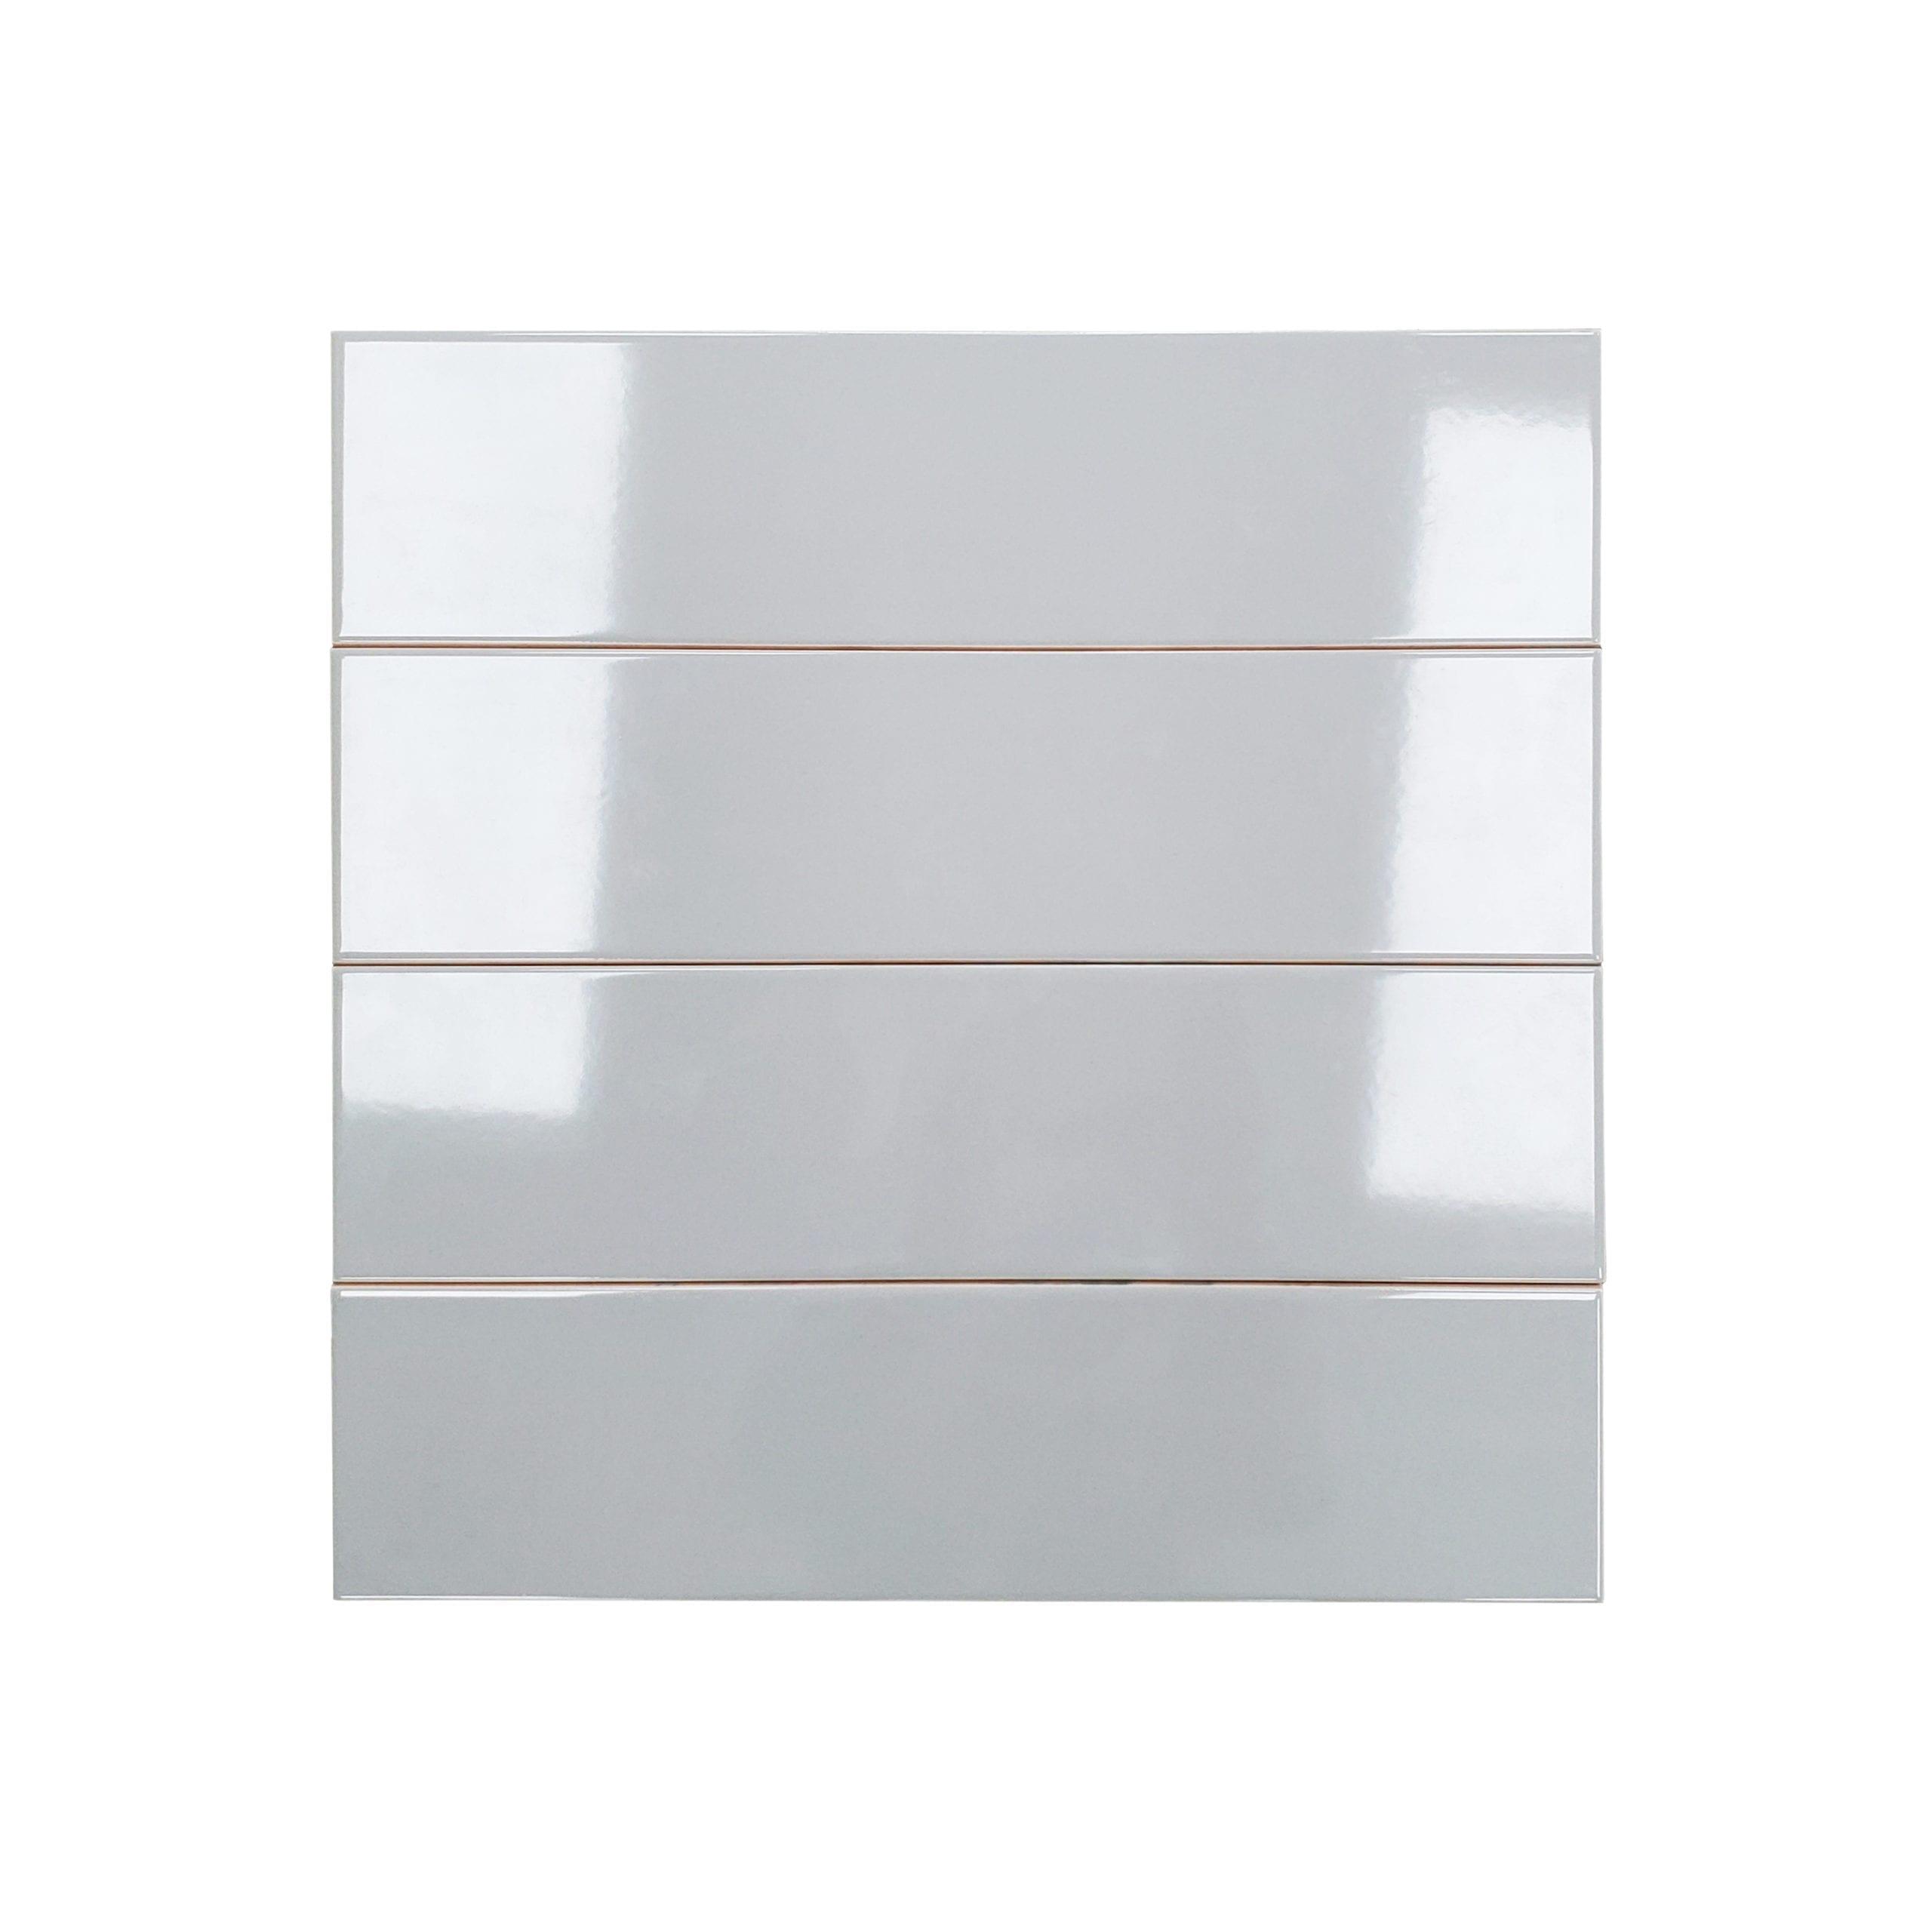 4×16 Soho Glossy Tile_Taupe_1.99